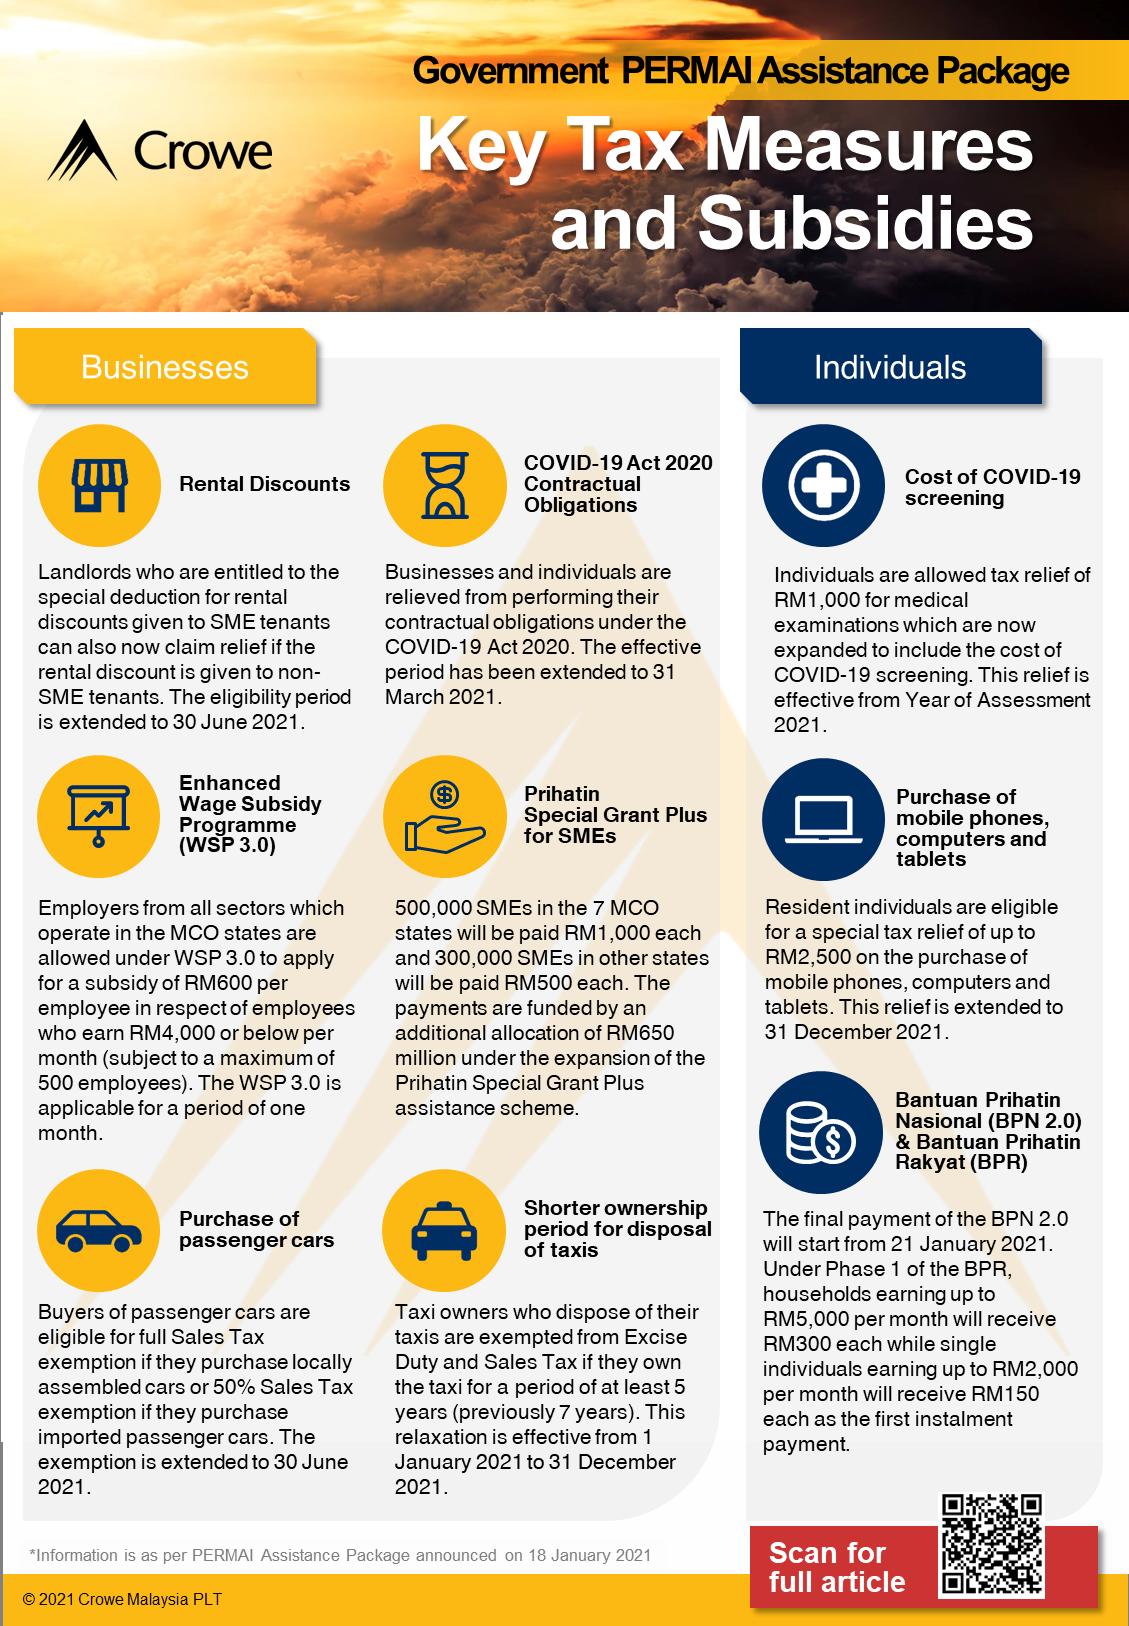 PERMAI 2021 Tax Measure & Subsidies Infographic